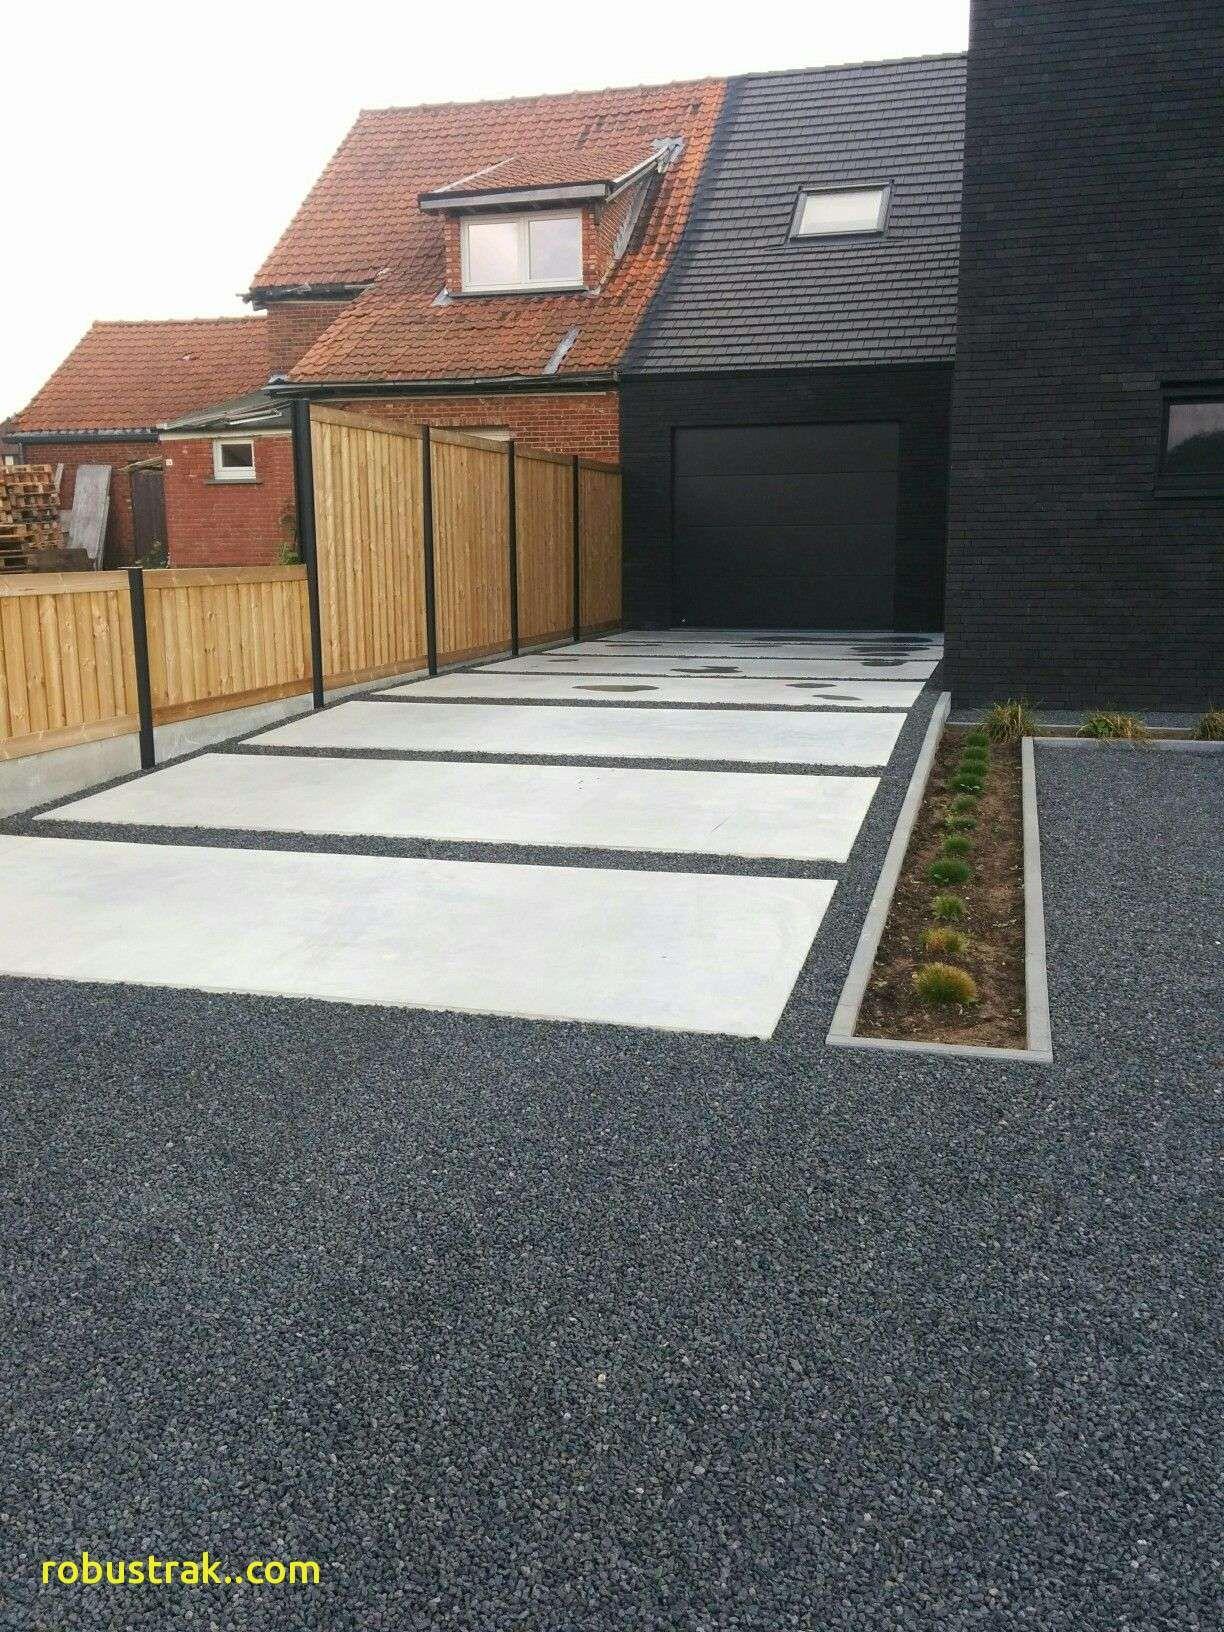 Schulz Garden Tips Driveways Construction Backyard Homes